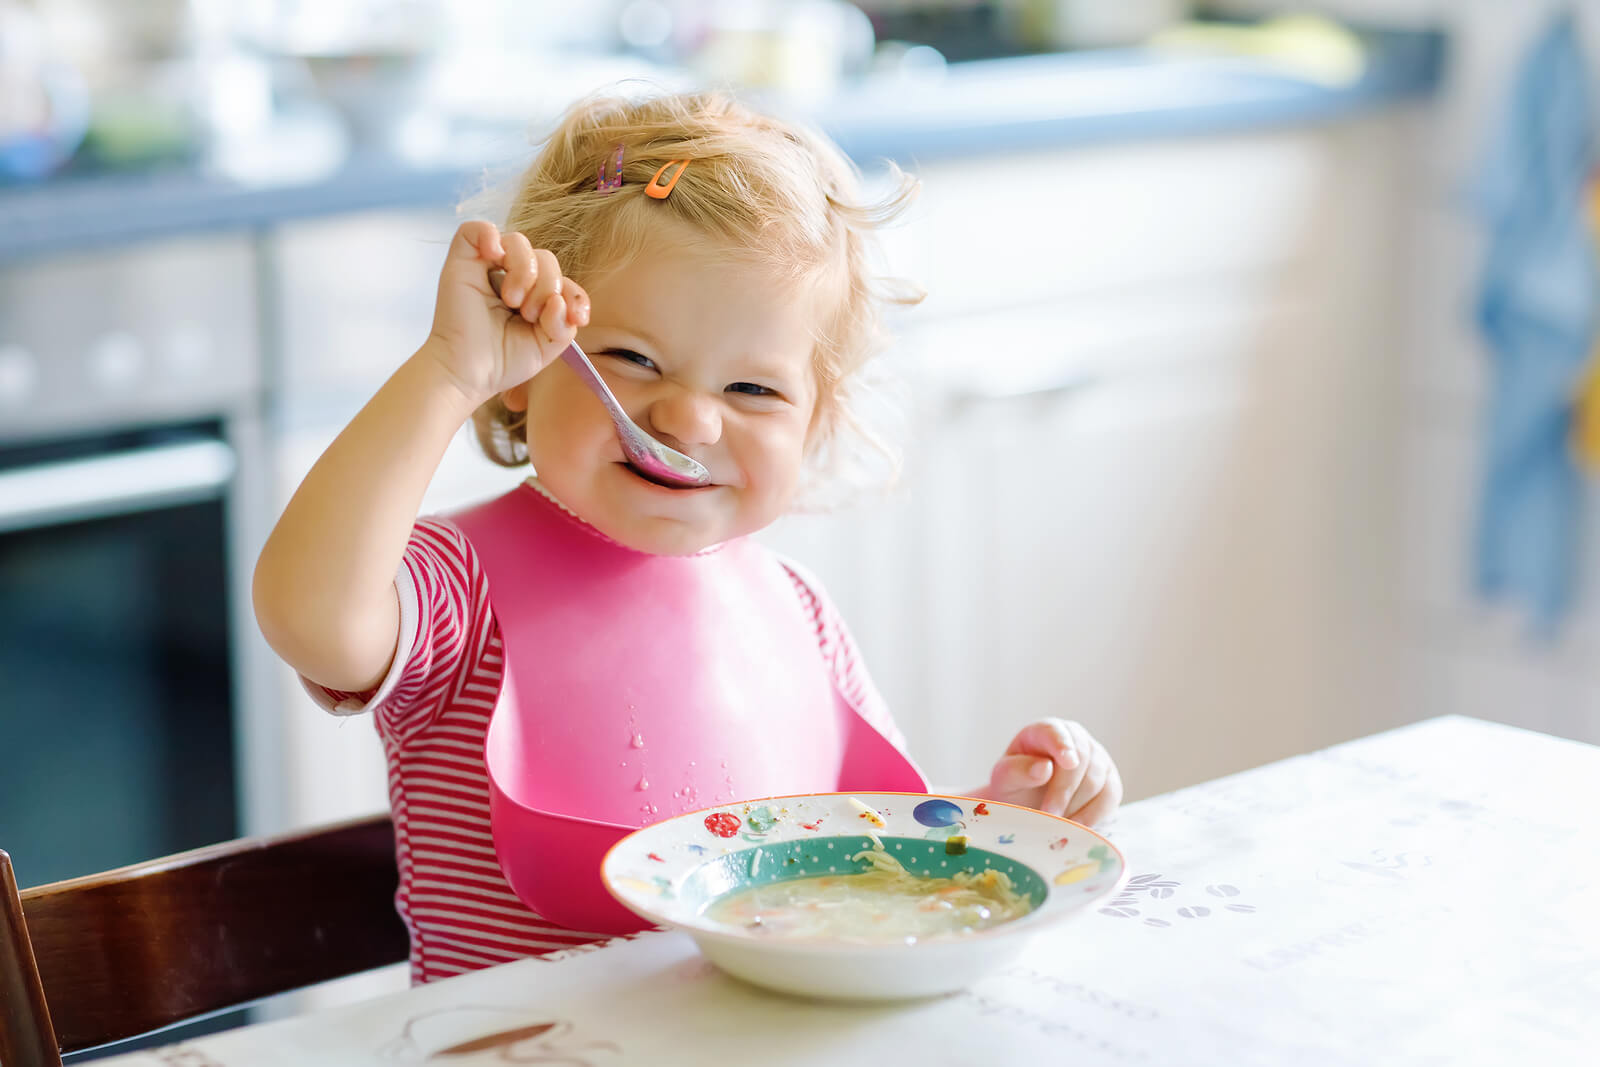 Bebé comiendo solo con cuchara une dieta con gluten.